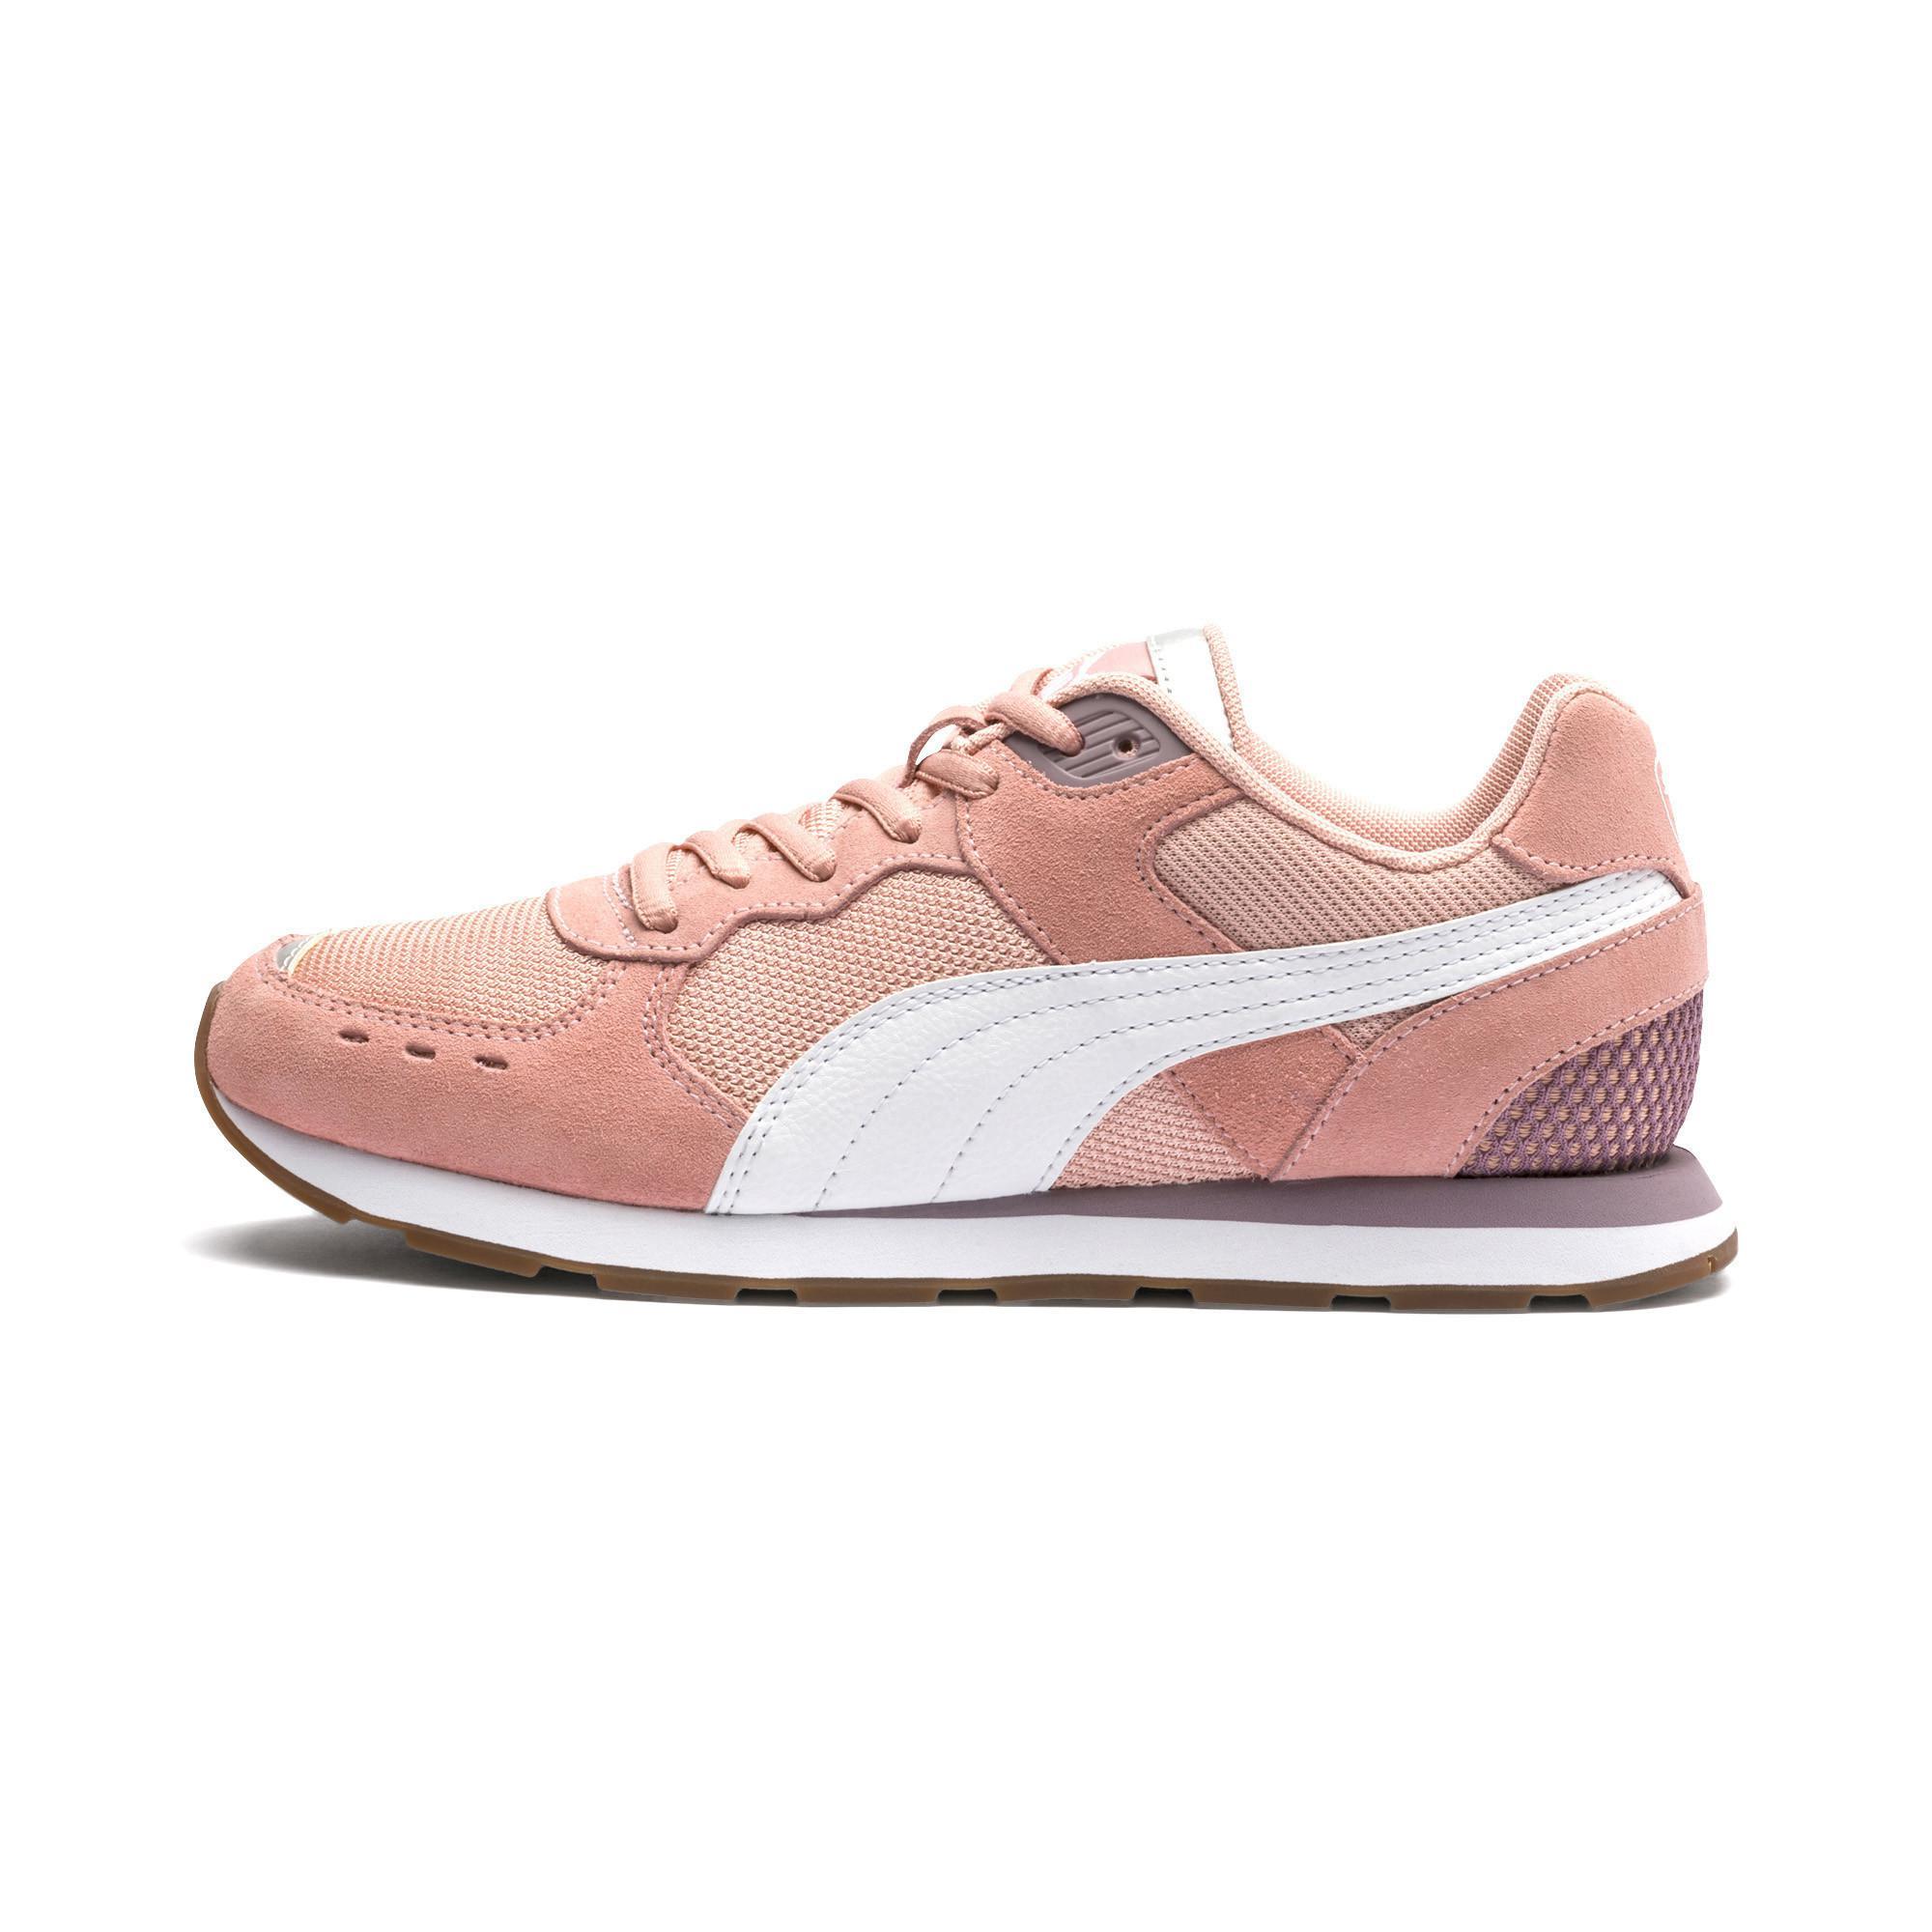 22e88ebaa3cd Lyst - PUMA Vista Women s Sneakers